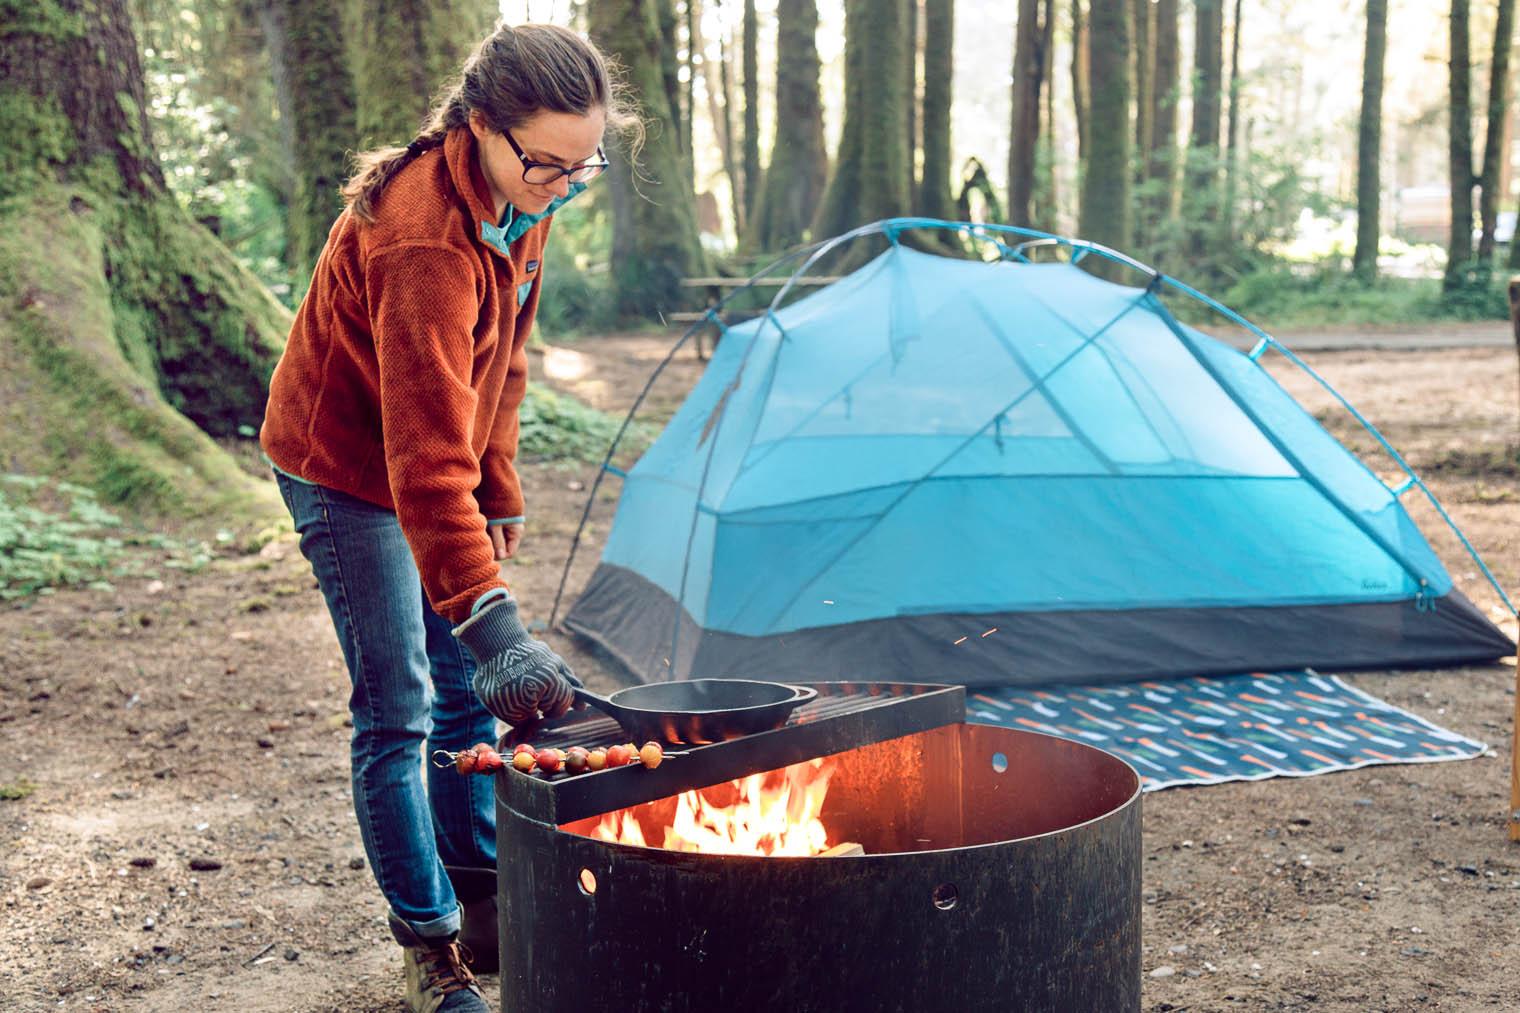 Megan moving a skillet over a campfire